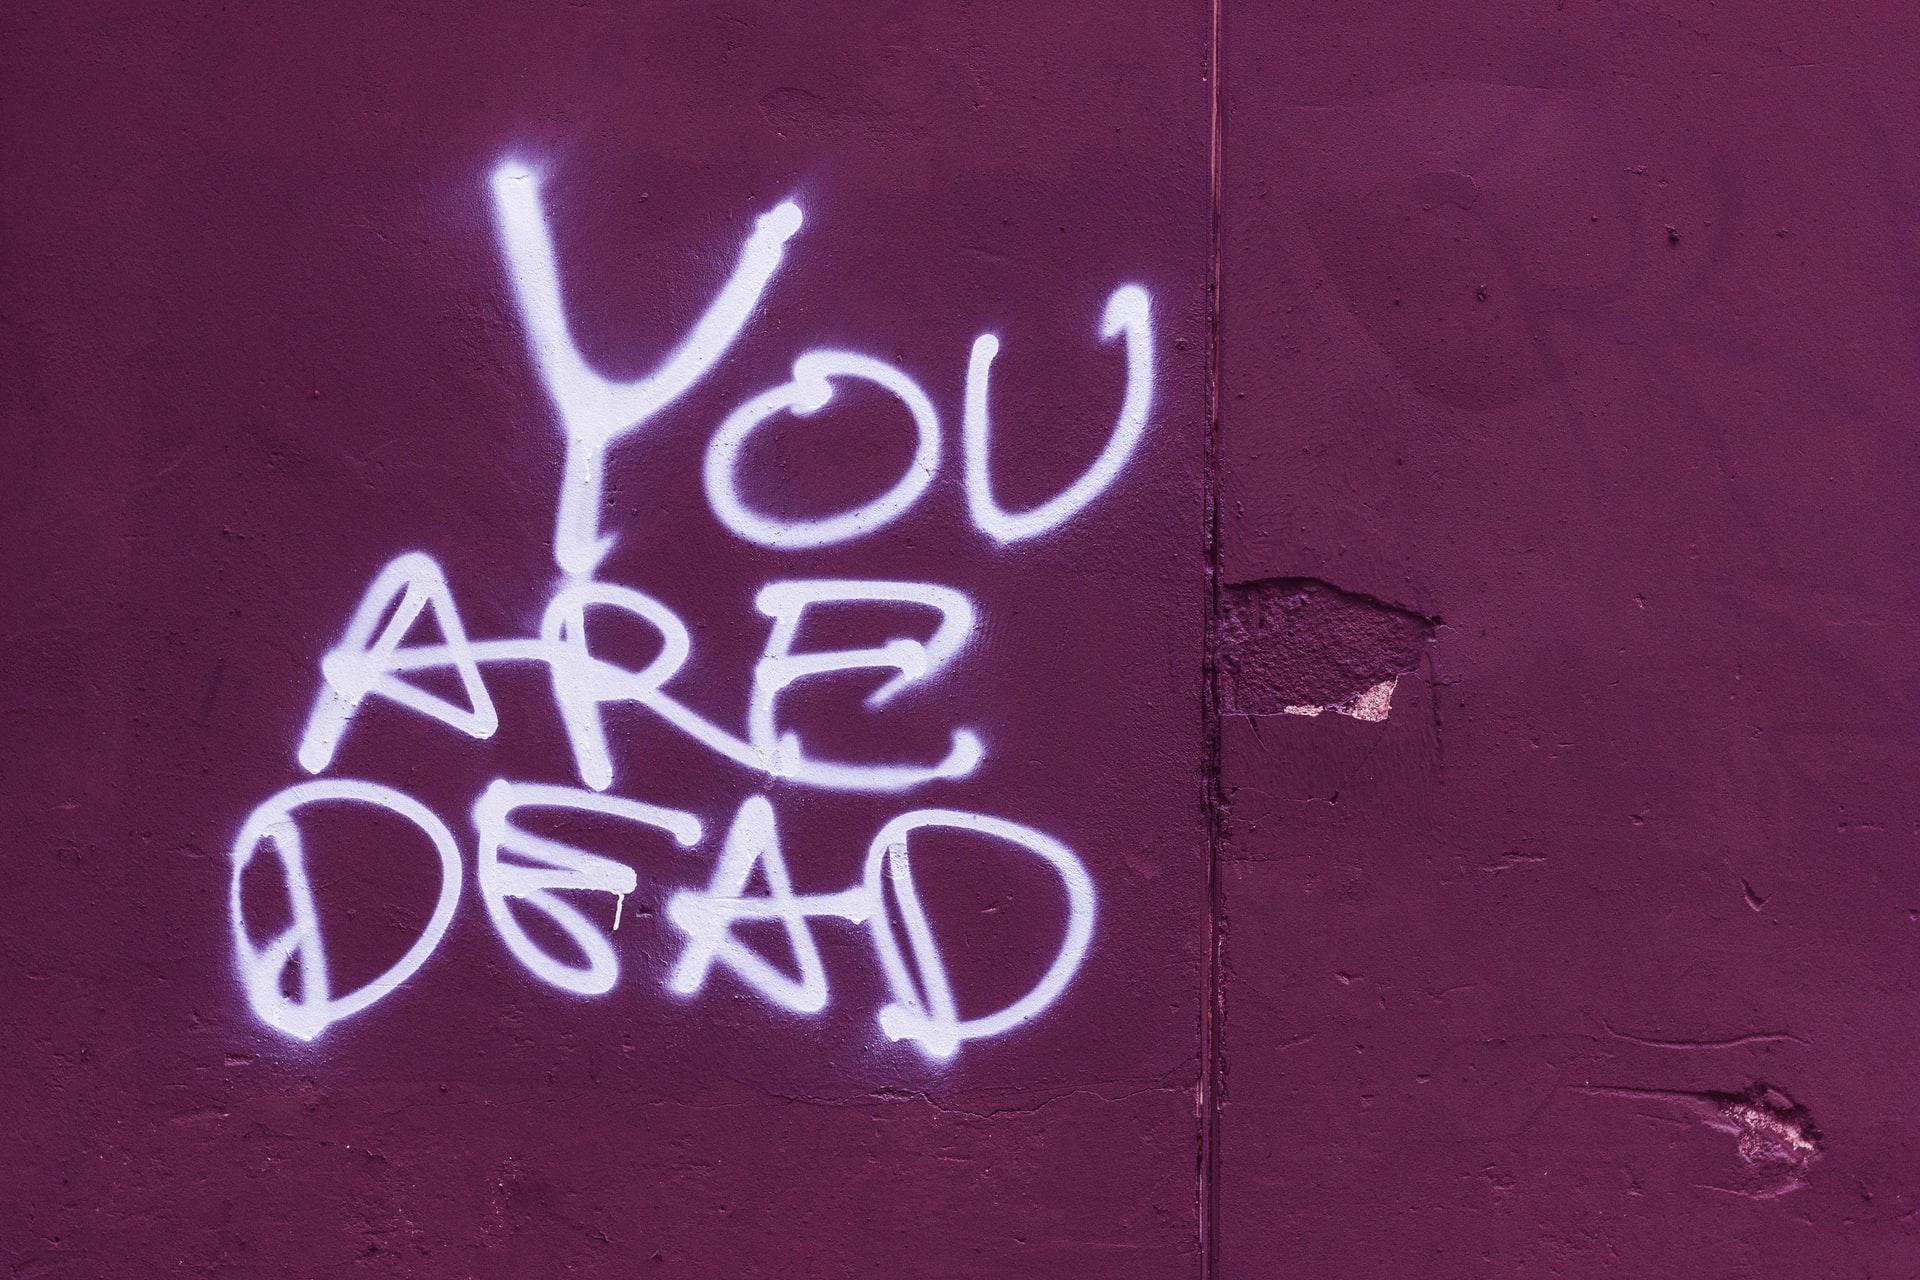 graffiti saying YOU ARE DEAD